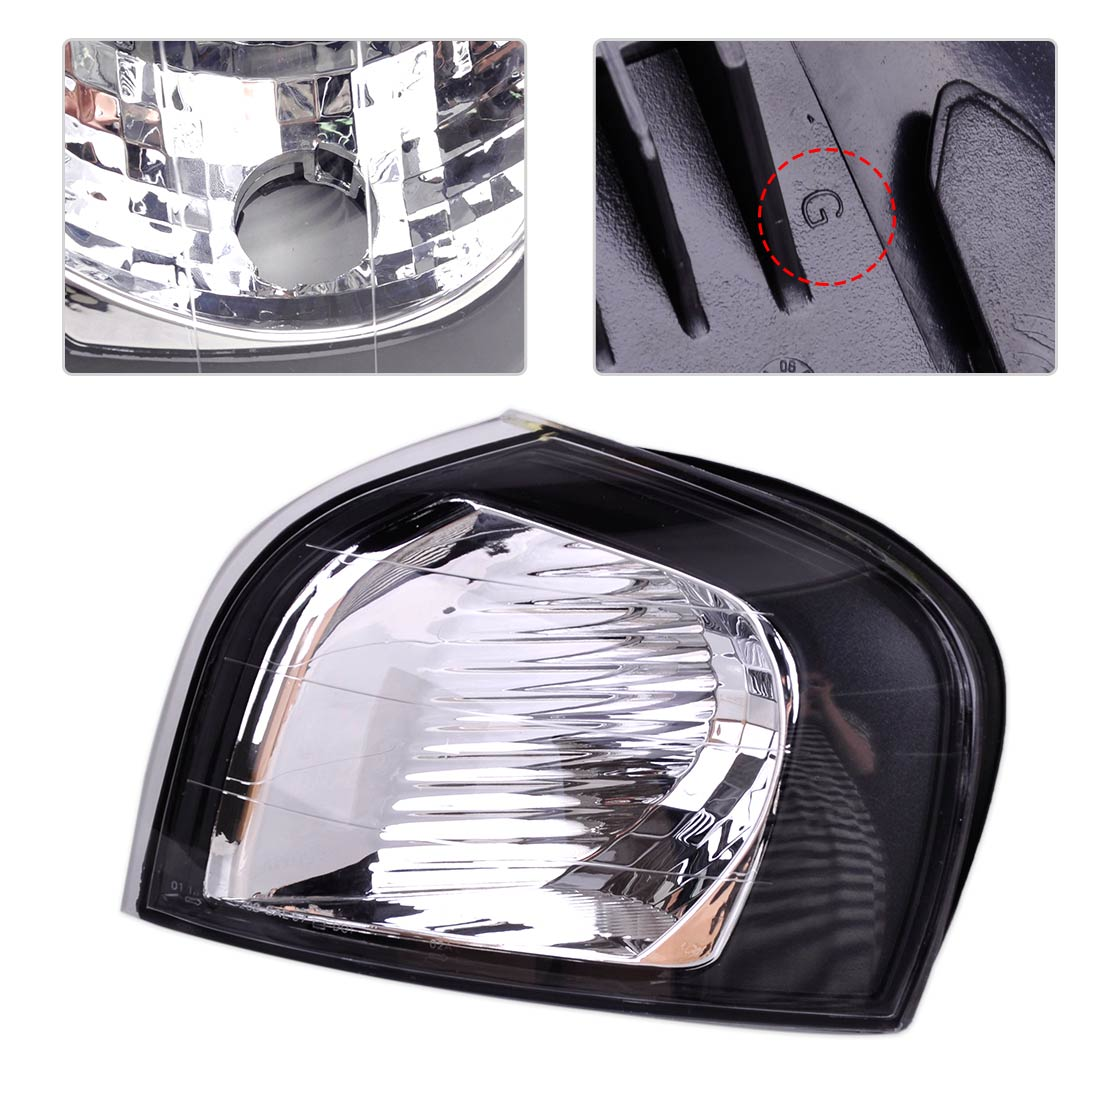 DWCX New Car Black Plastic Left Turn Signal Corner Light Lamp 30655422 fit for Volvo S80 1999 2000 2001 2002 2003 2004 2005 2006